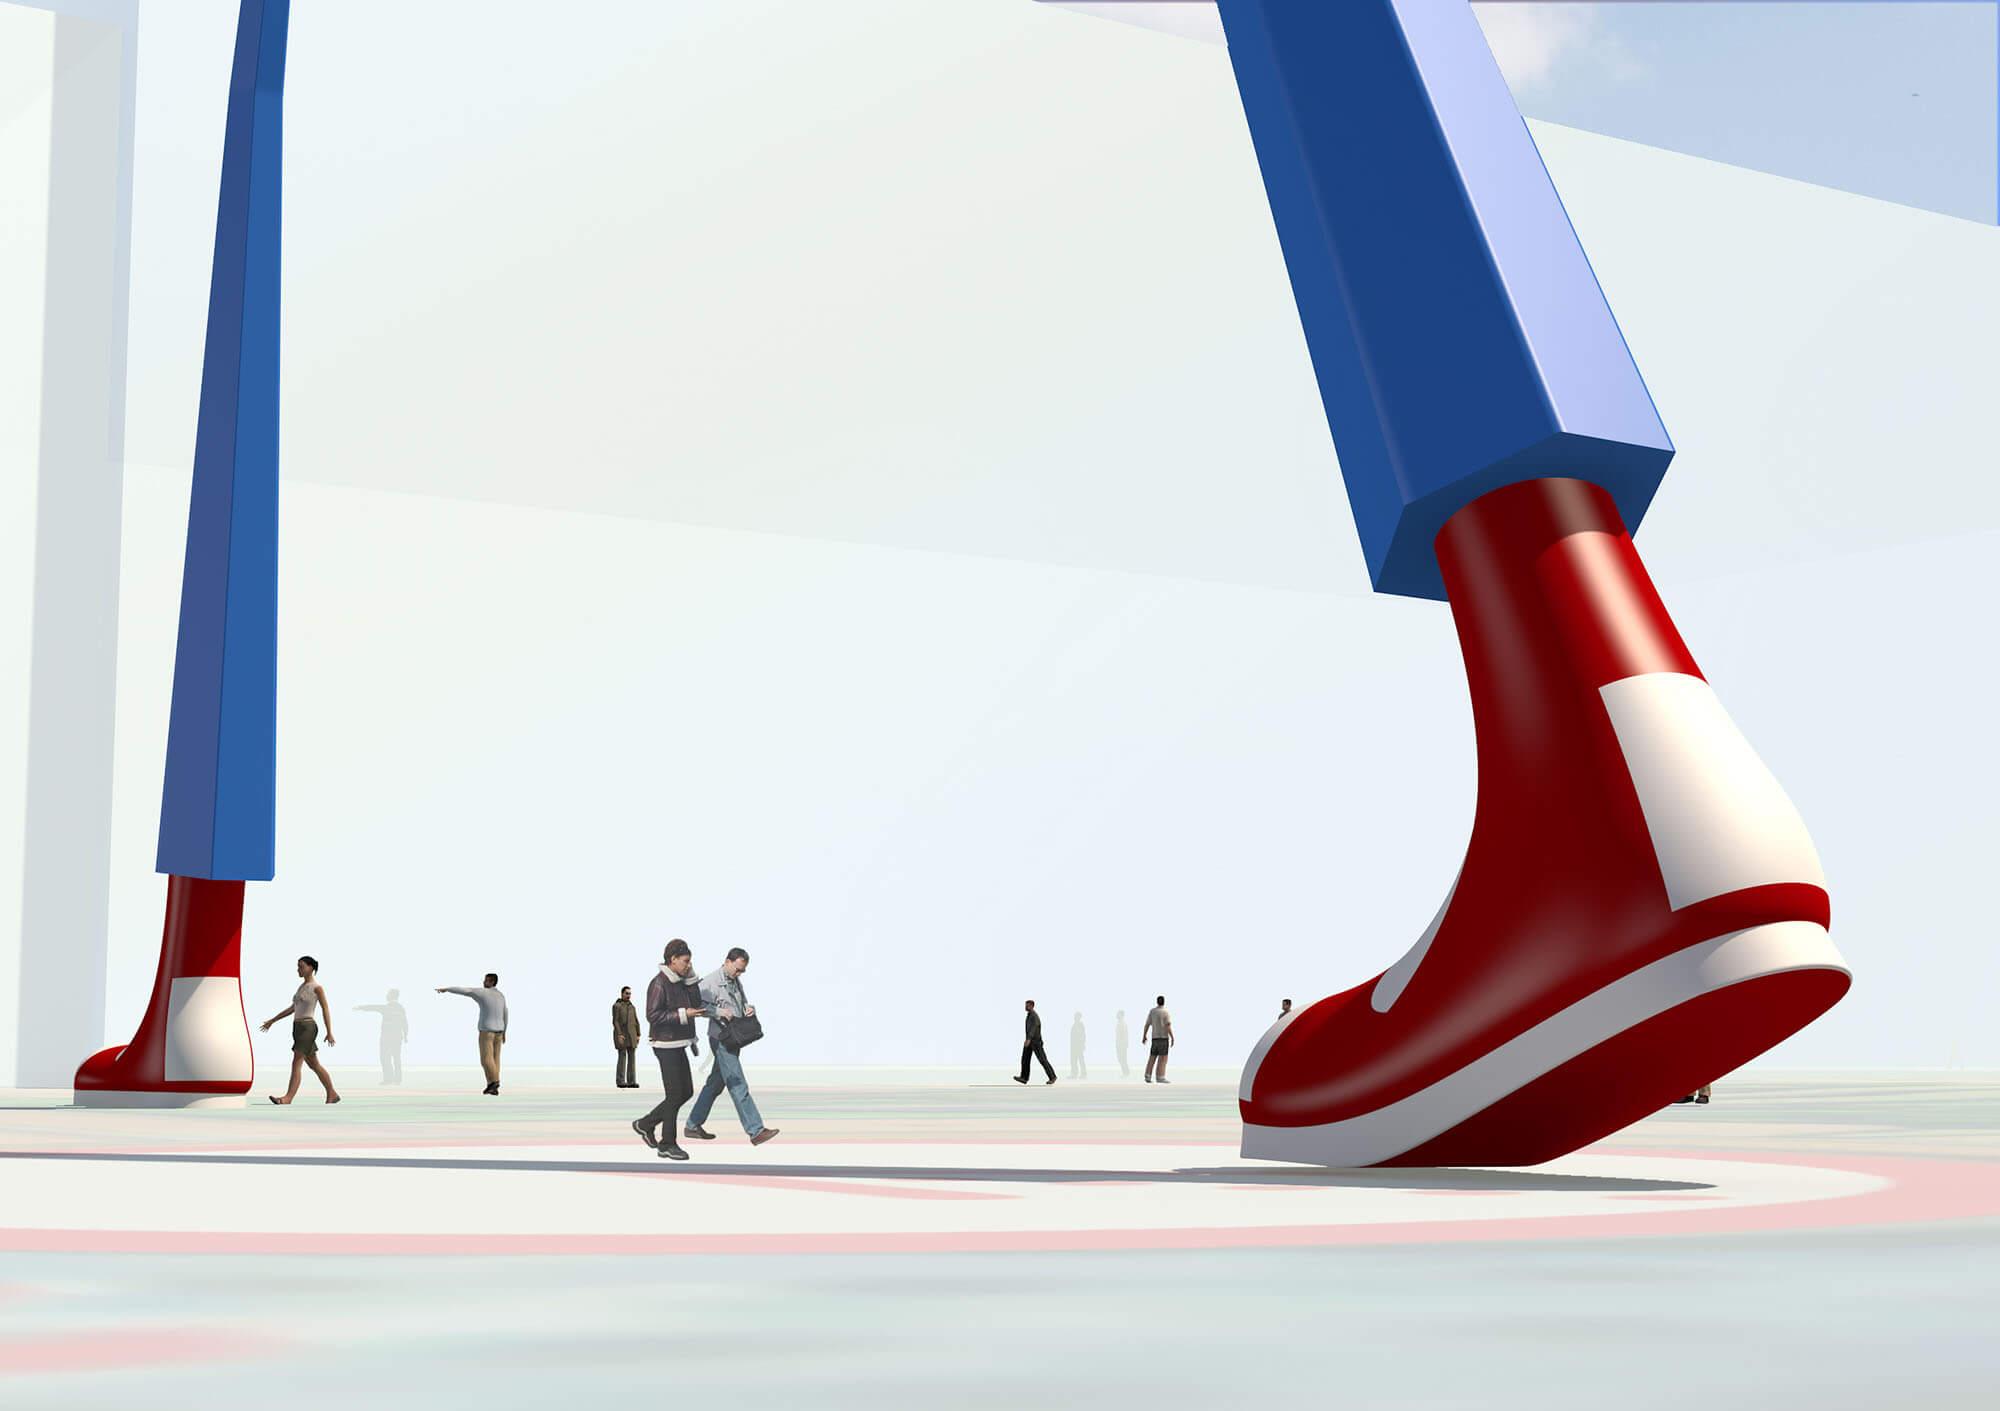 Inges Idee | インゲス・イデー 現代美術・アート Contemporary Art